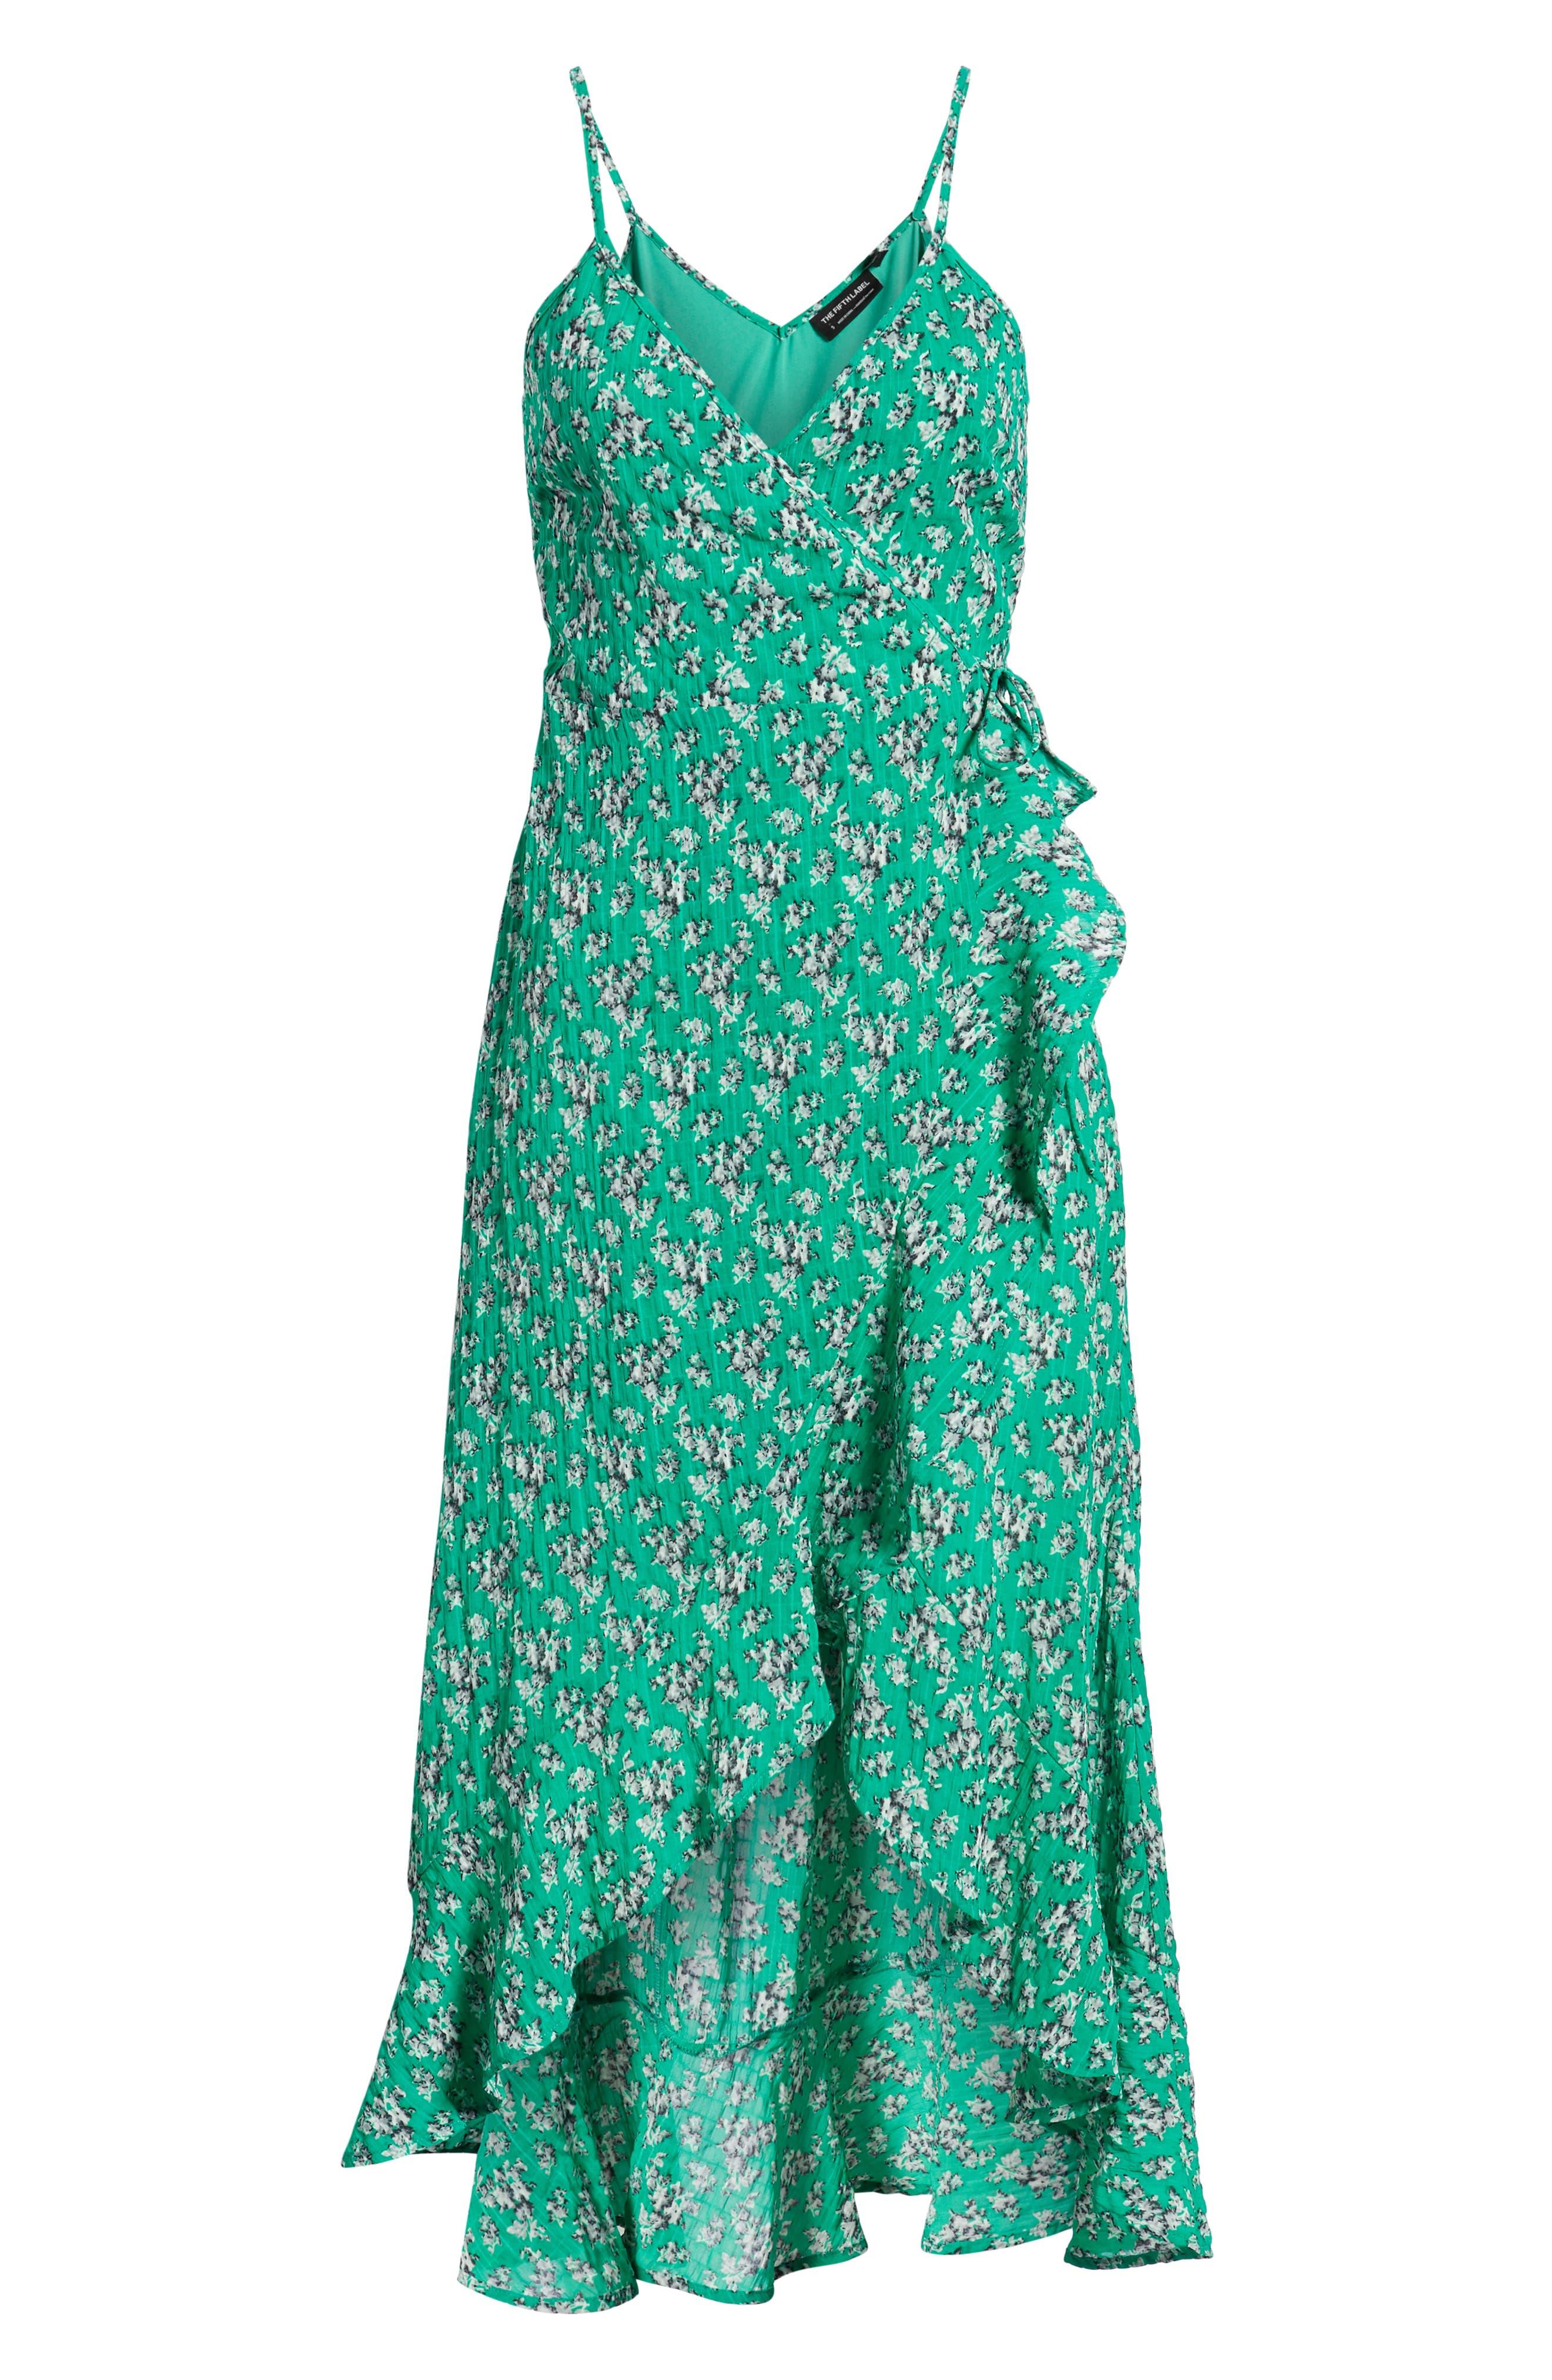 Adventurer Floral Print High/Low Dress,                             Alternate thumbnail 7, color,                             GREEN FLORAL